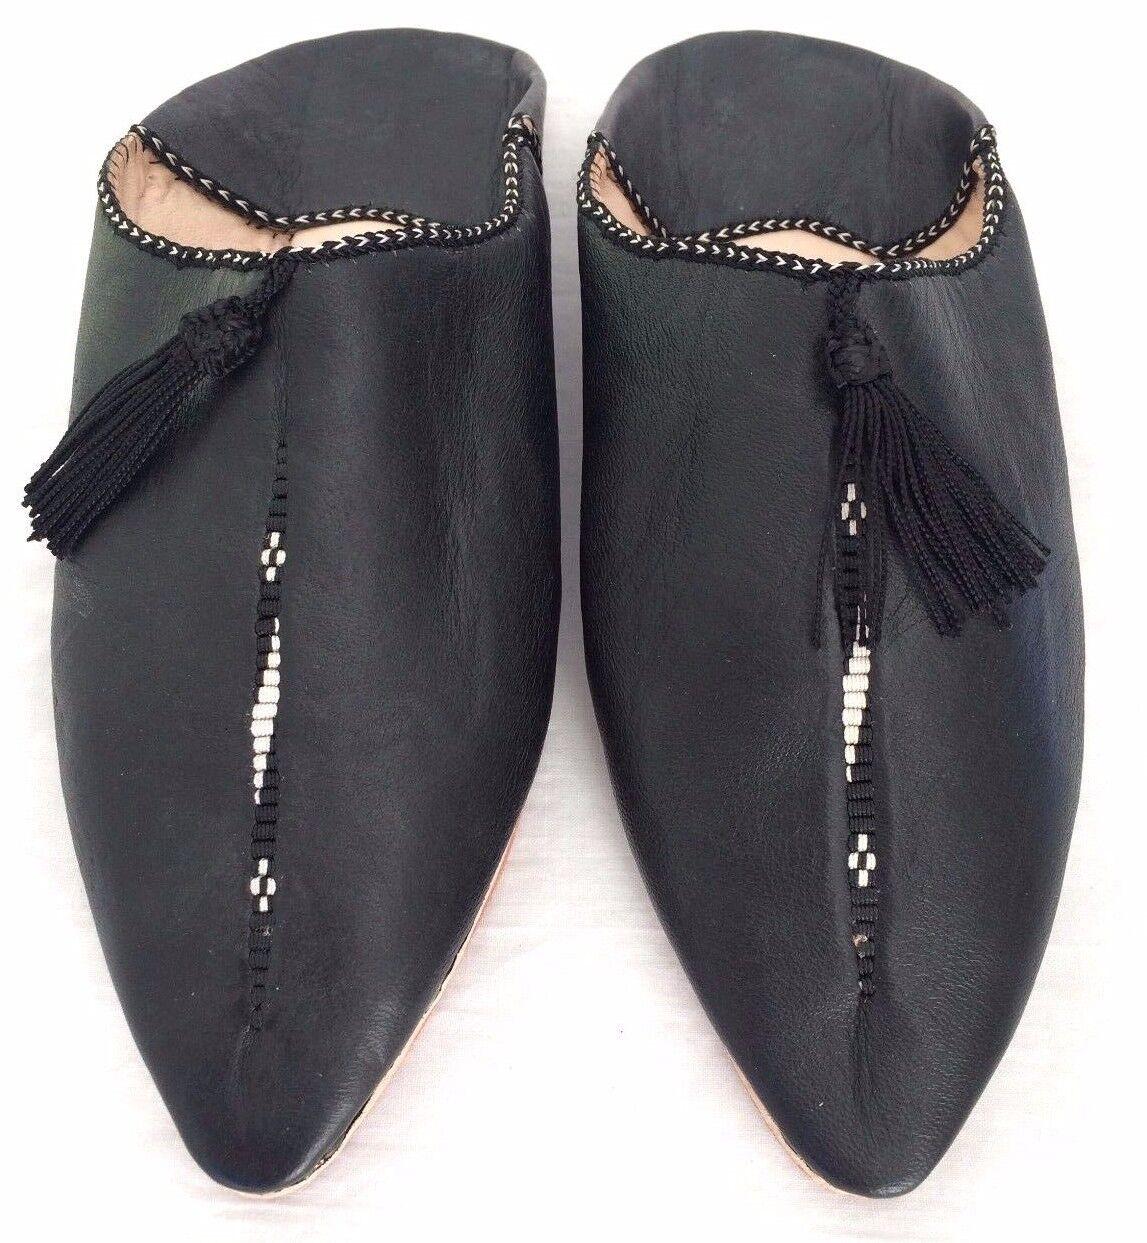 Babouche Marocaine woman leather shoe flat slipper embroidered Slipper black